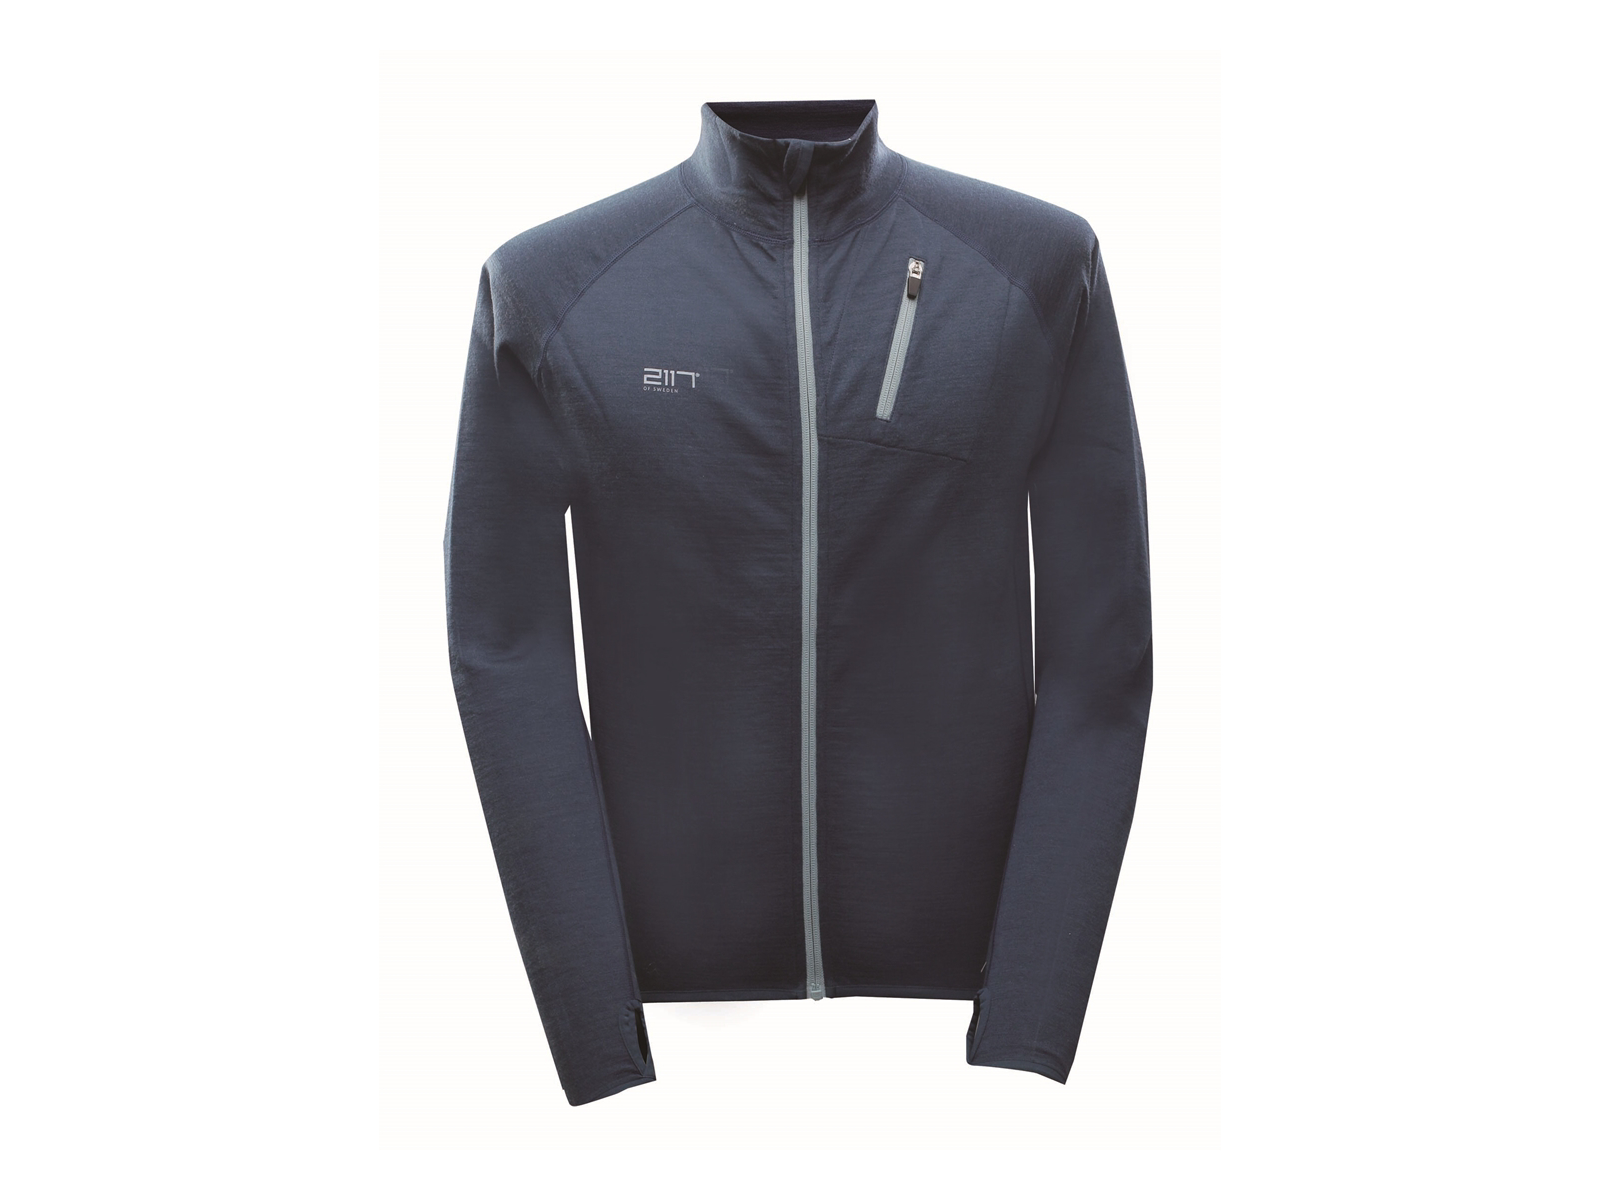 2117 Of Sweden Alltorp Merino Wool Jacket Fritidsjakke Herre Navy (DKK 399,00)